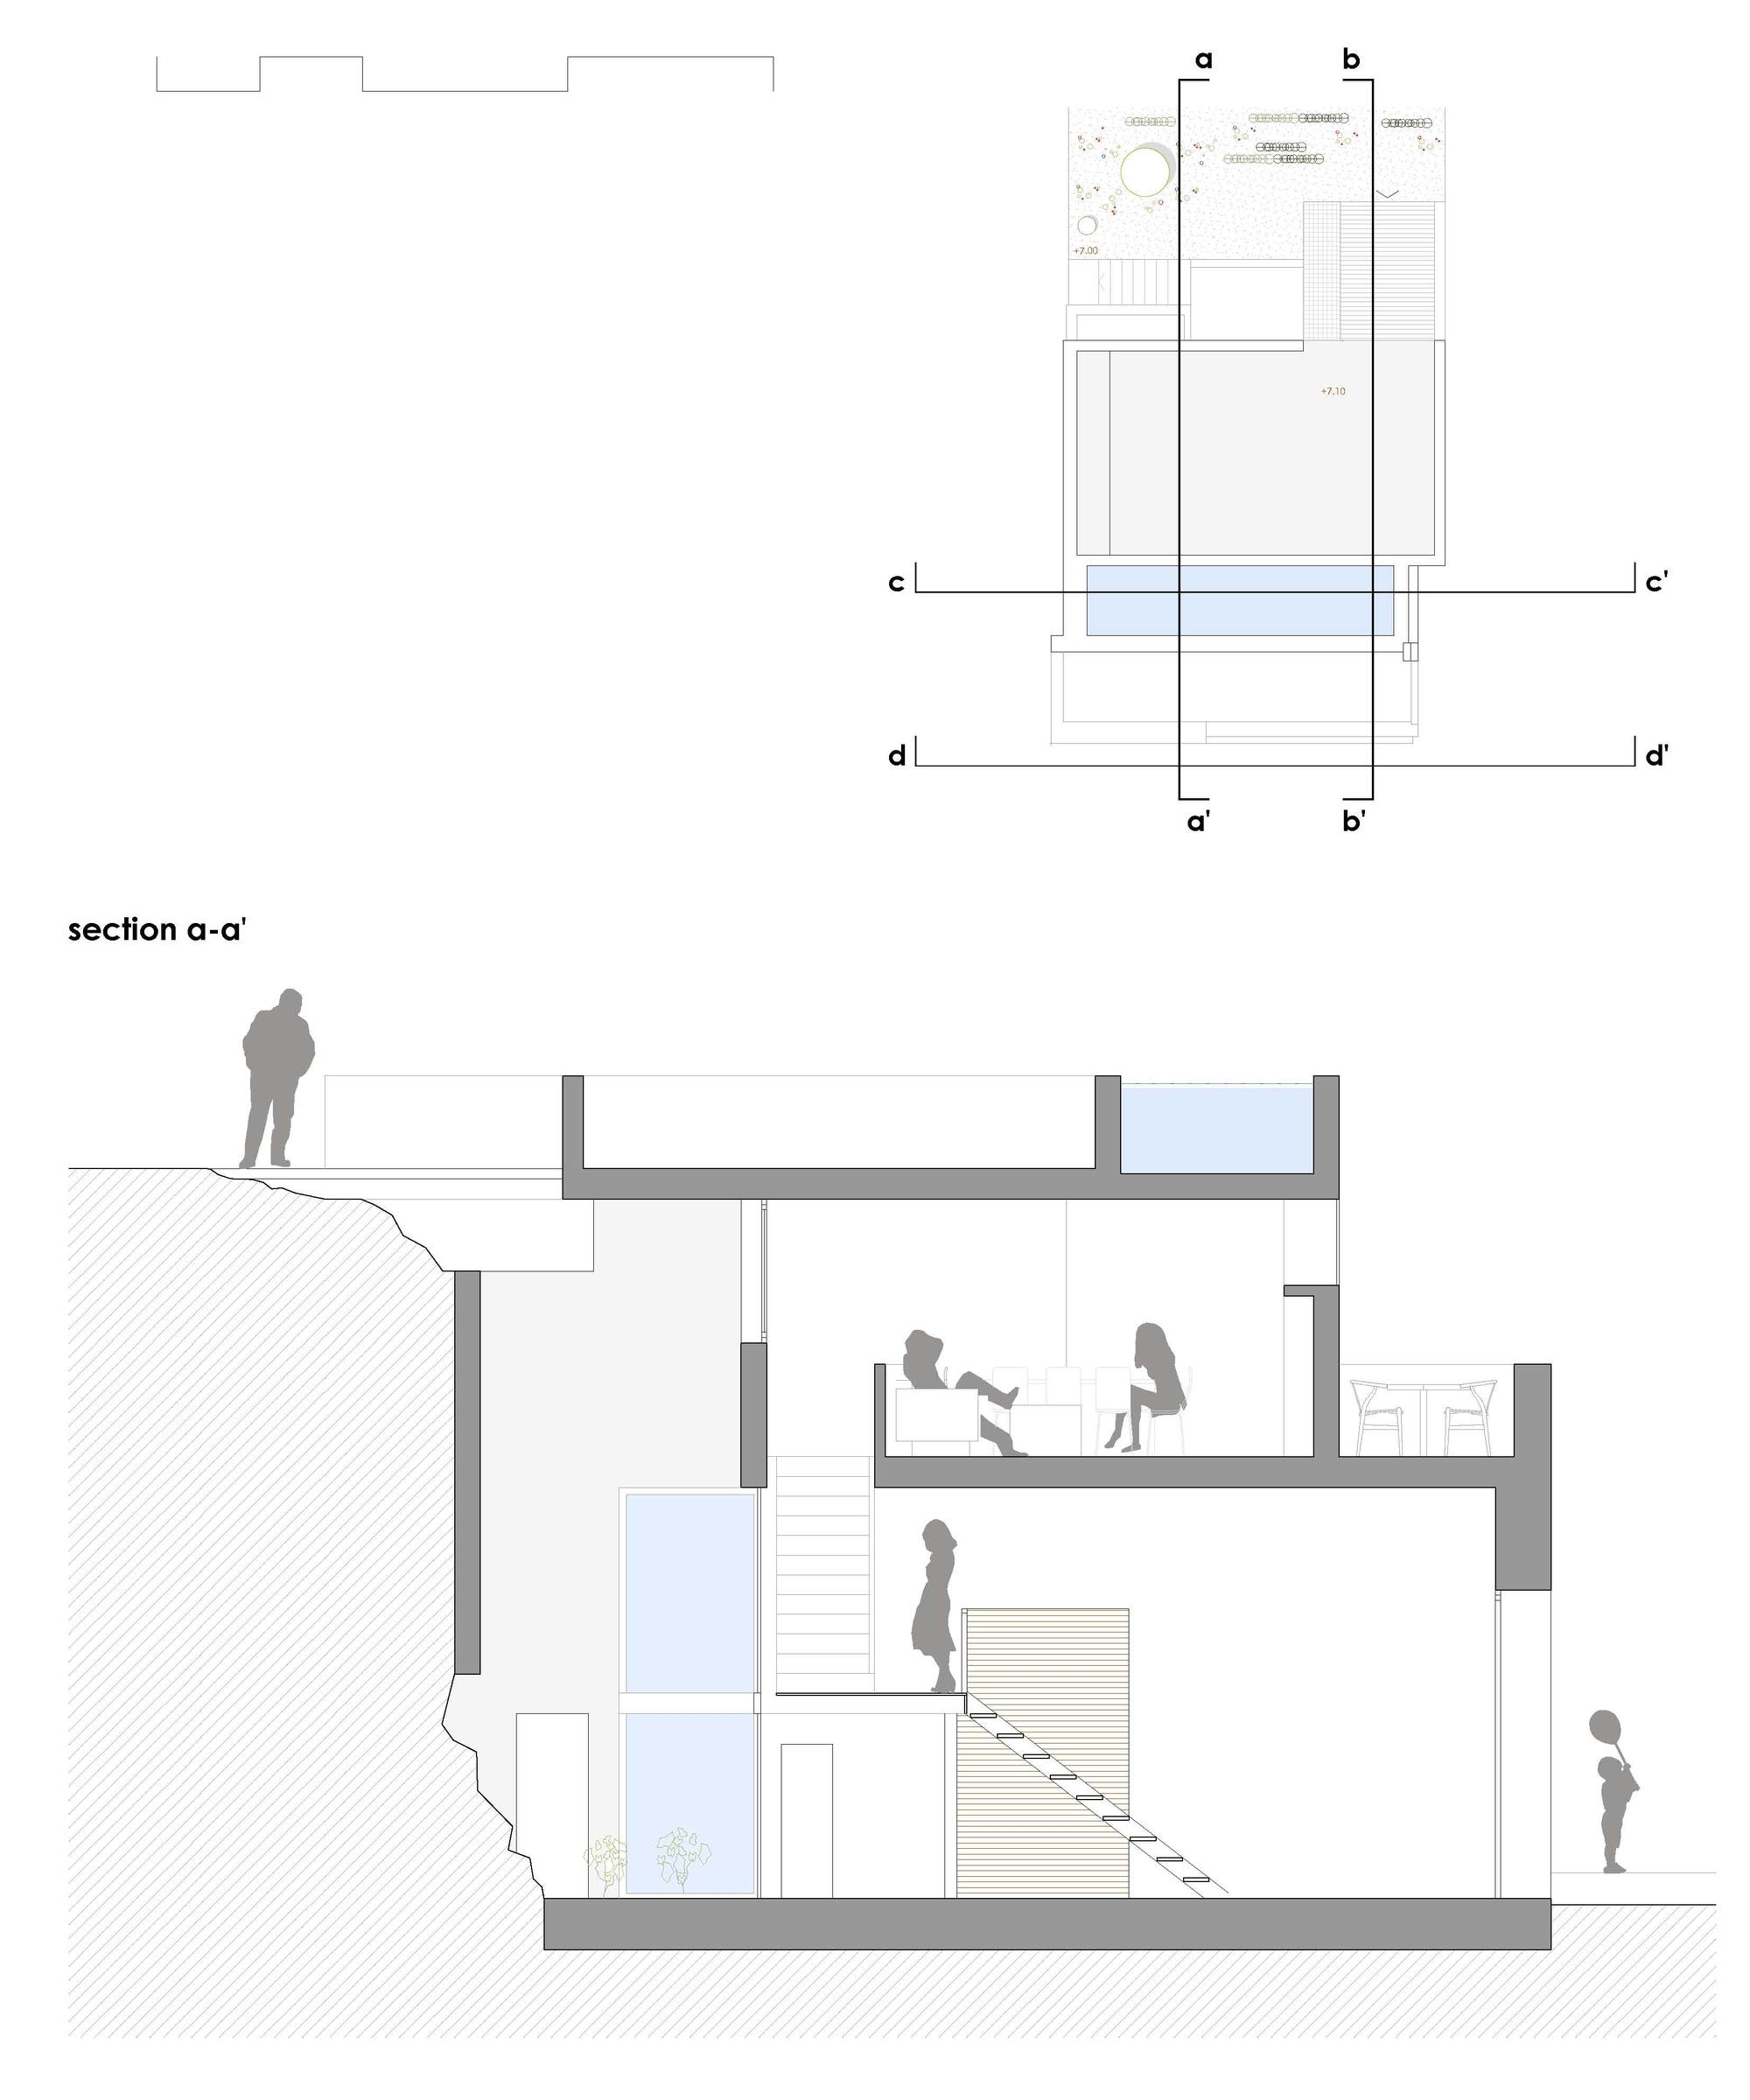 galer a de casa para un pintor dtr studio architects 21. Black Bedroom Furniture Sets. Home Design Ideas